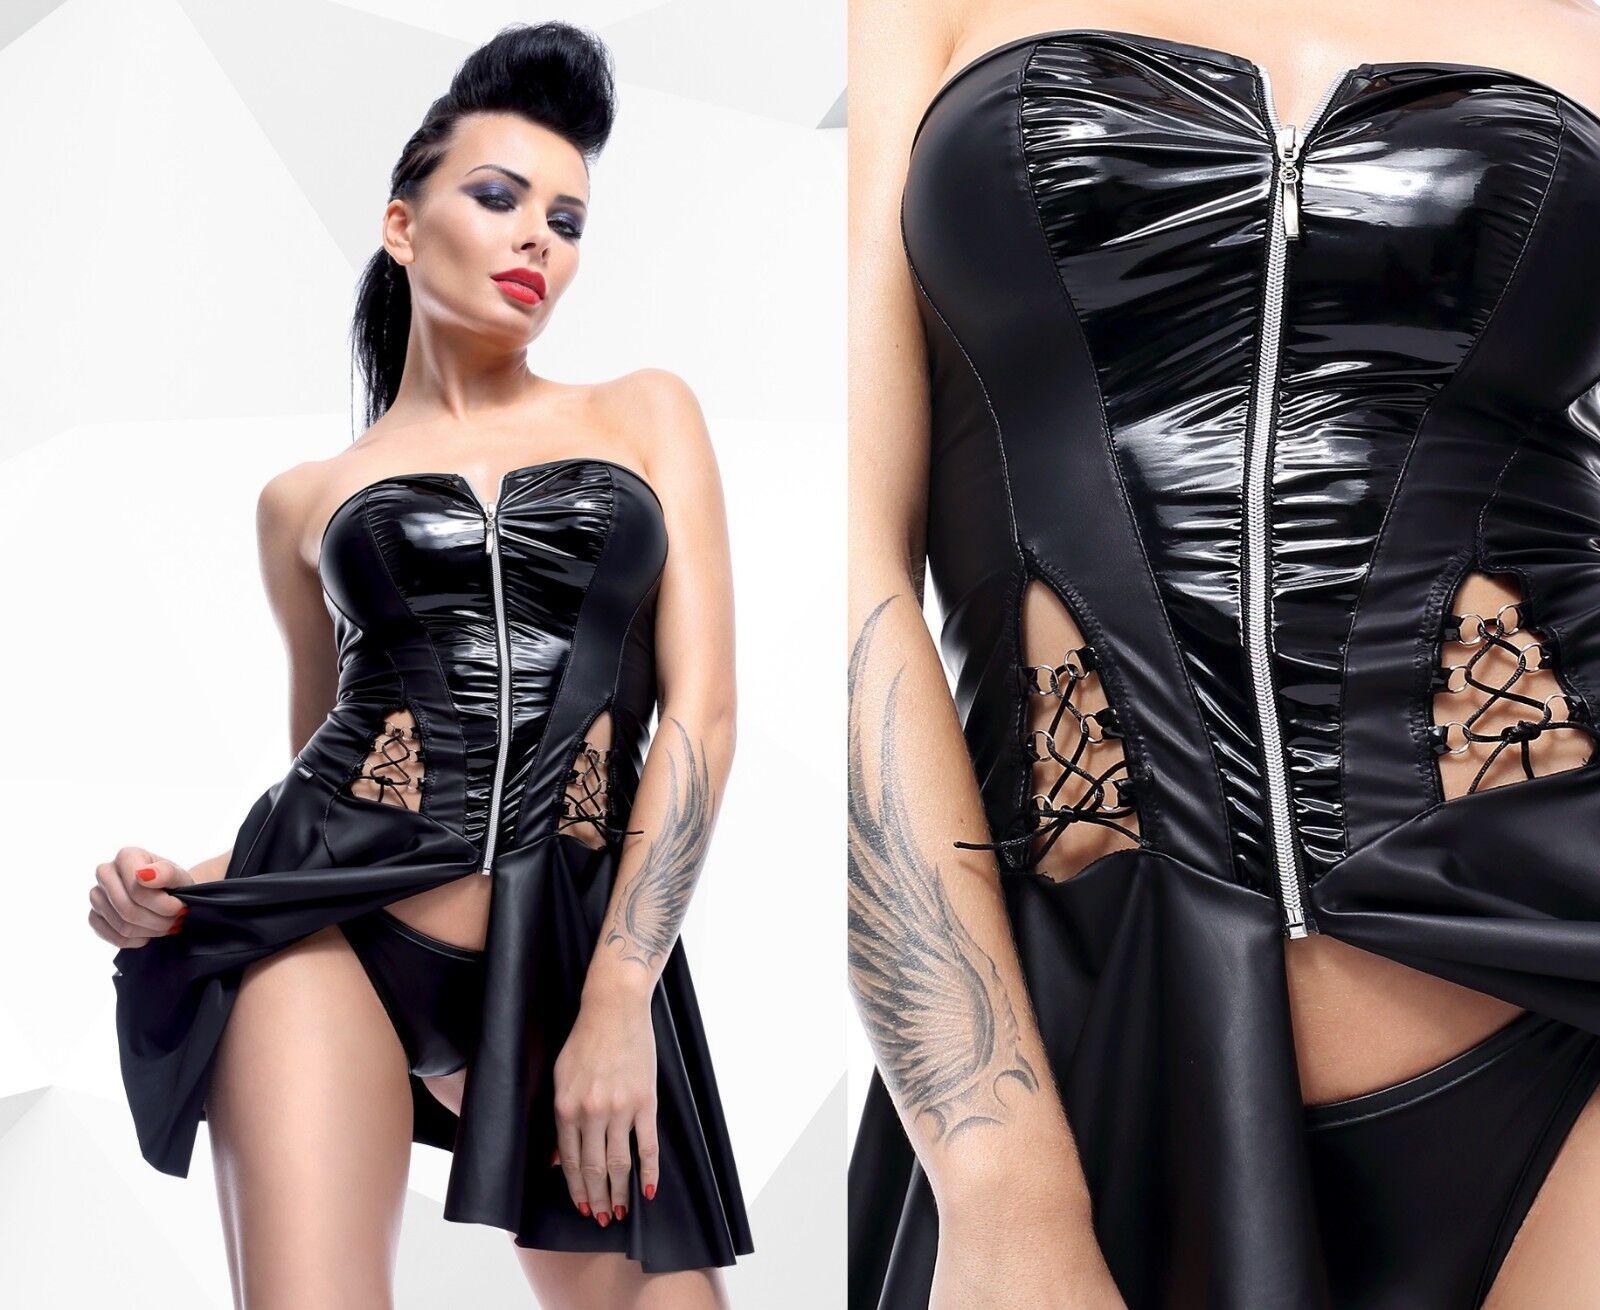 DEMONIQ RITA KLEID gothic schwarz schulterfrei wetlook clubwear lack pvc tunika